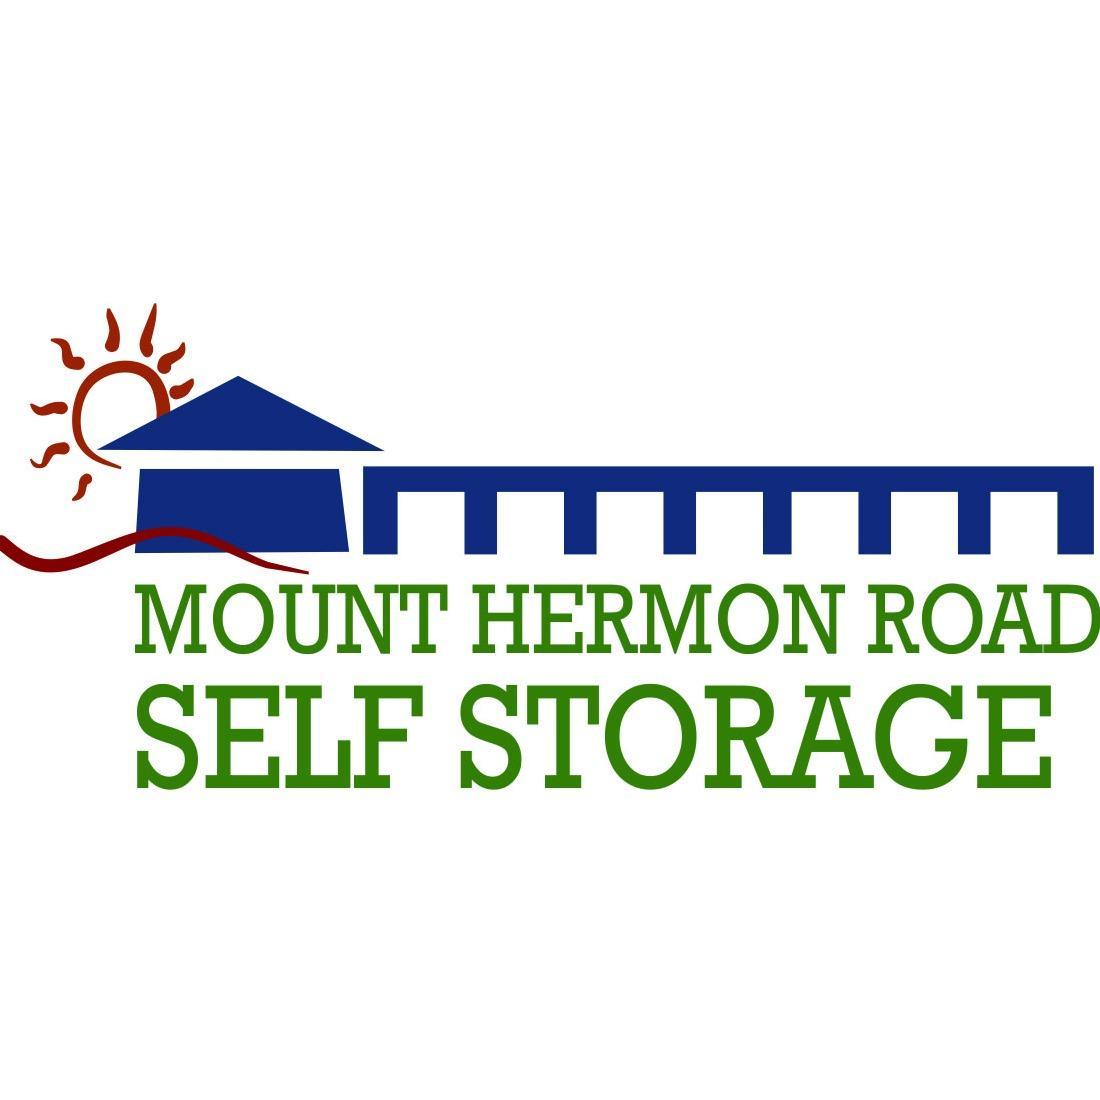 Mount Hernon Road Self Storage image 0